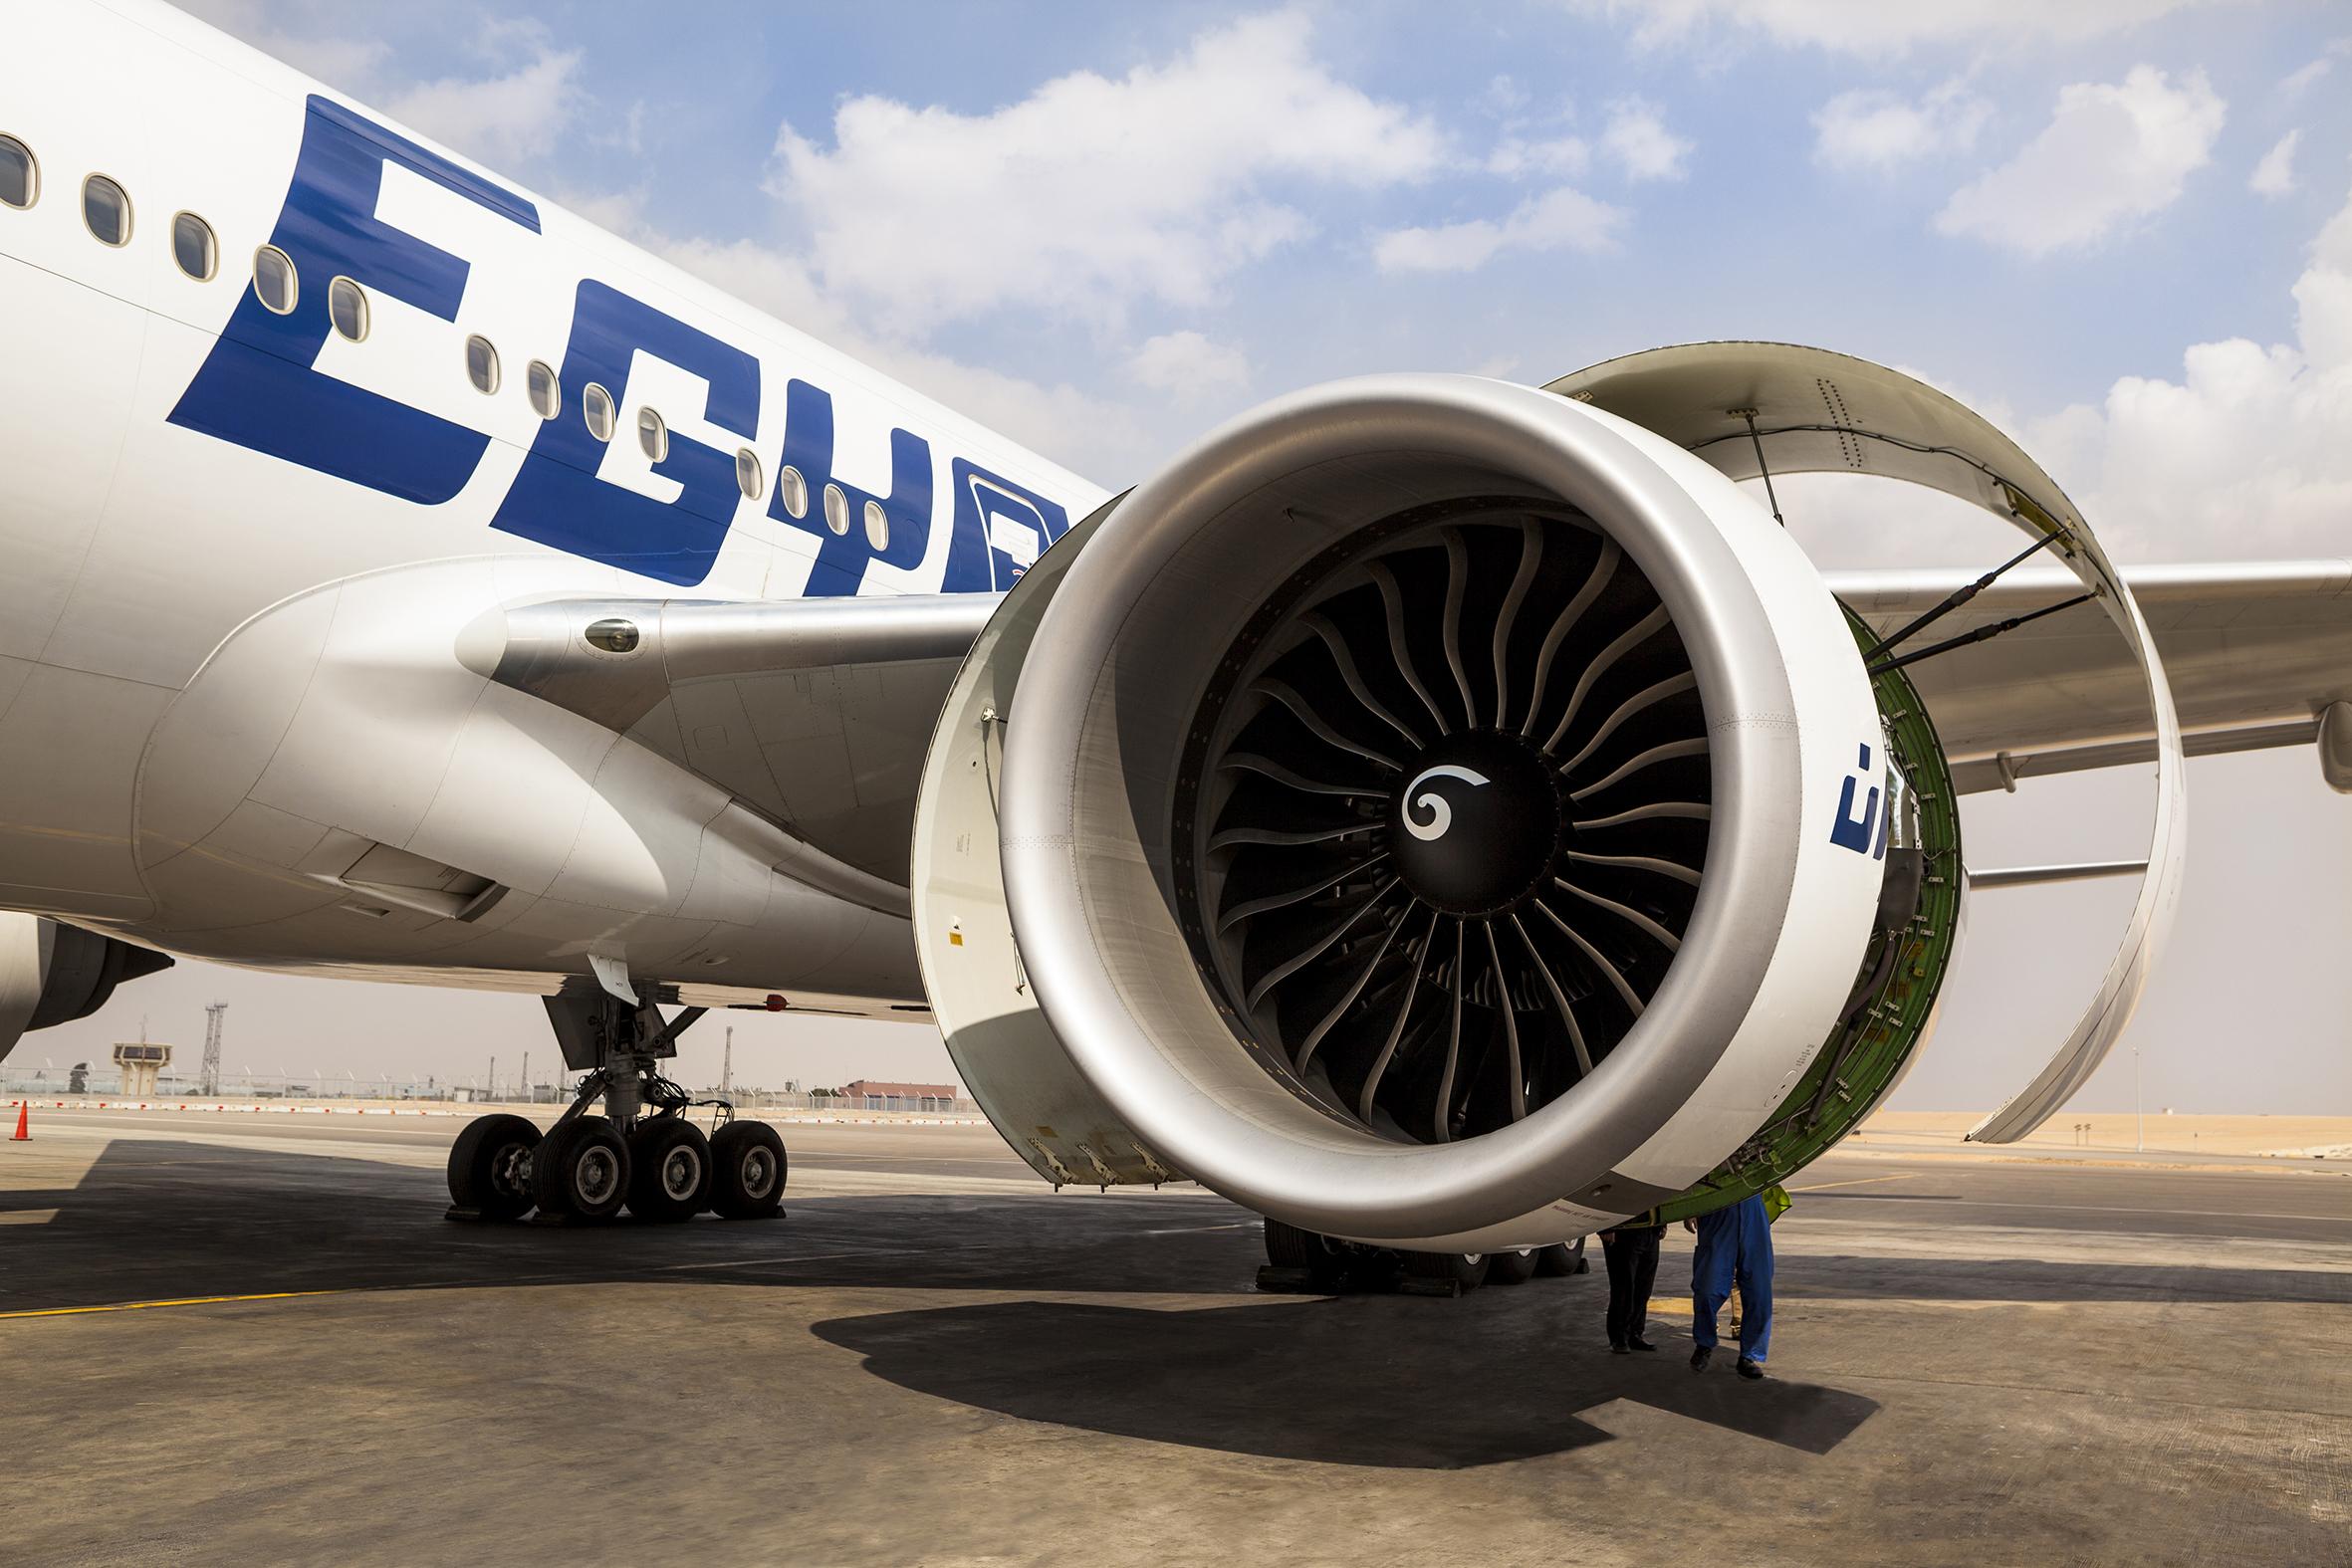 EGYPTAIR signs GE's TrueChoice agreement for overhaul